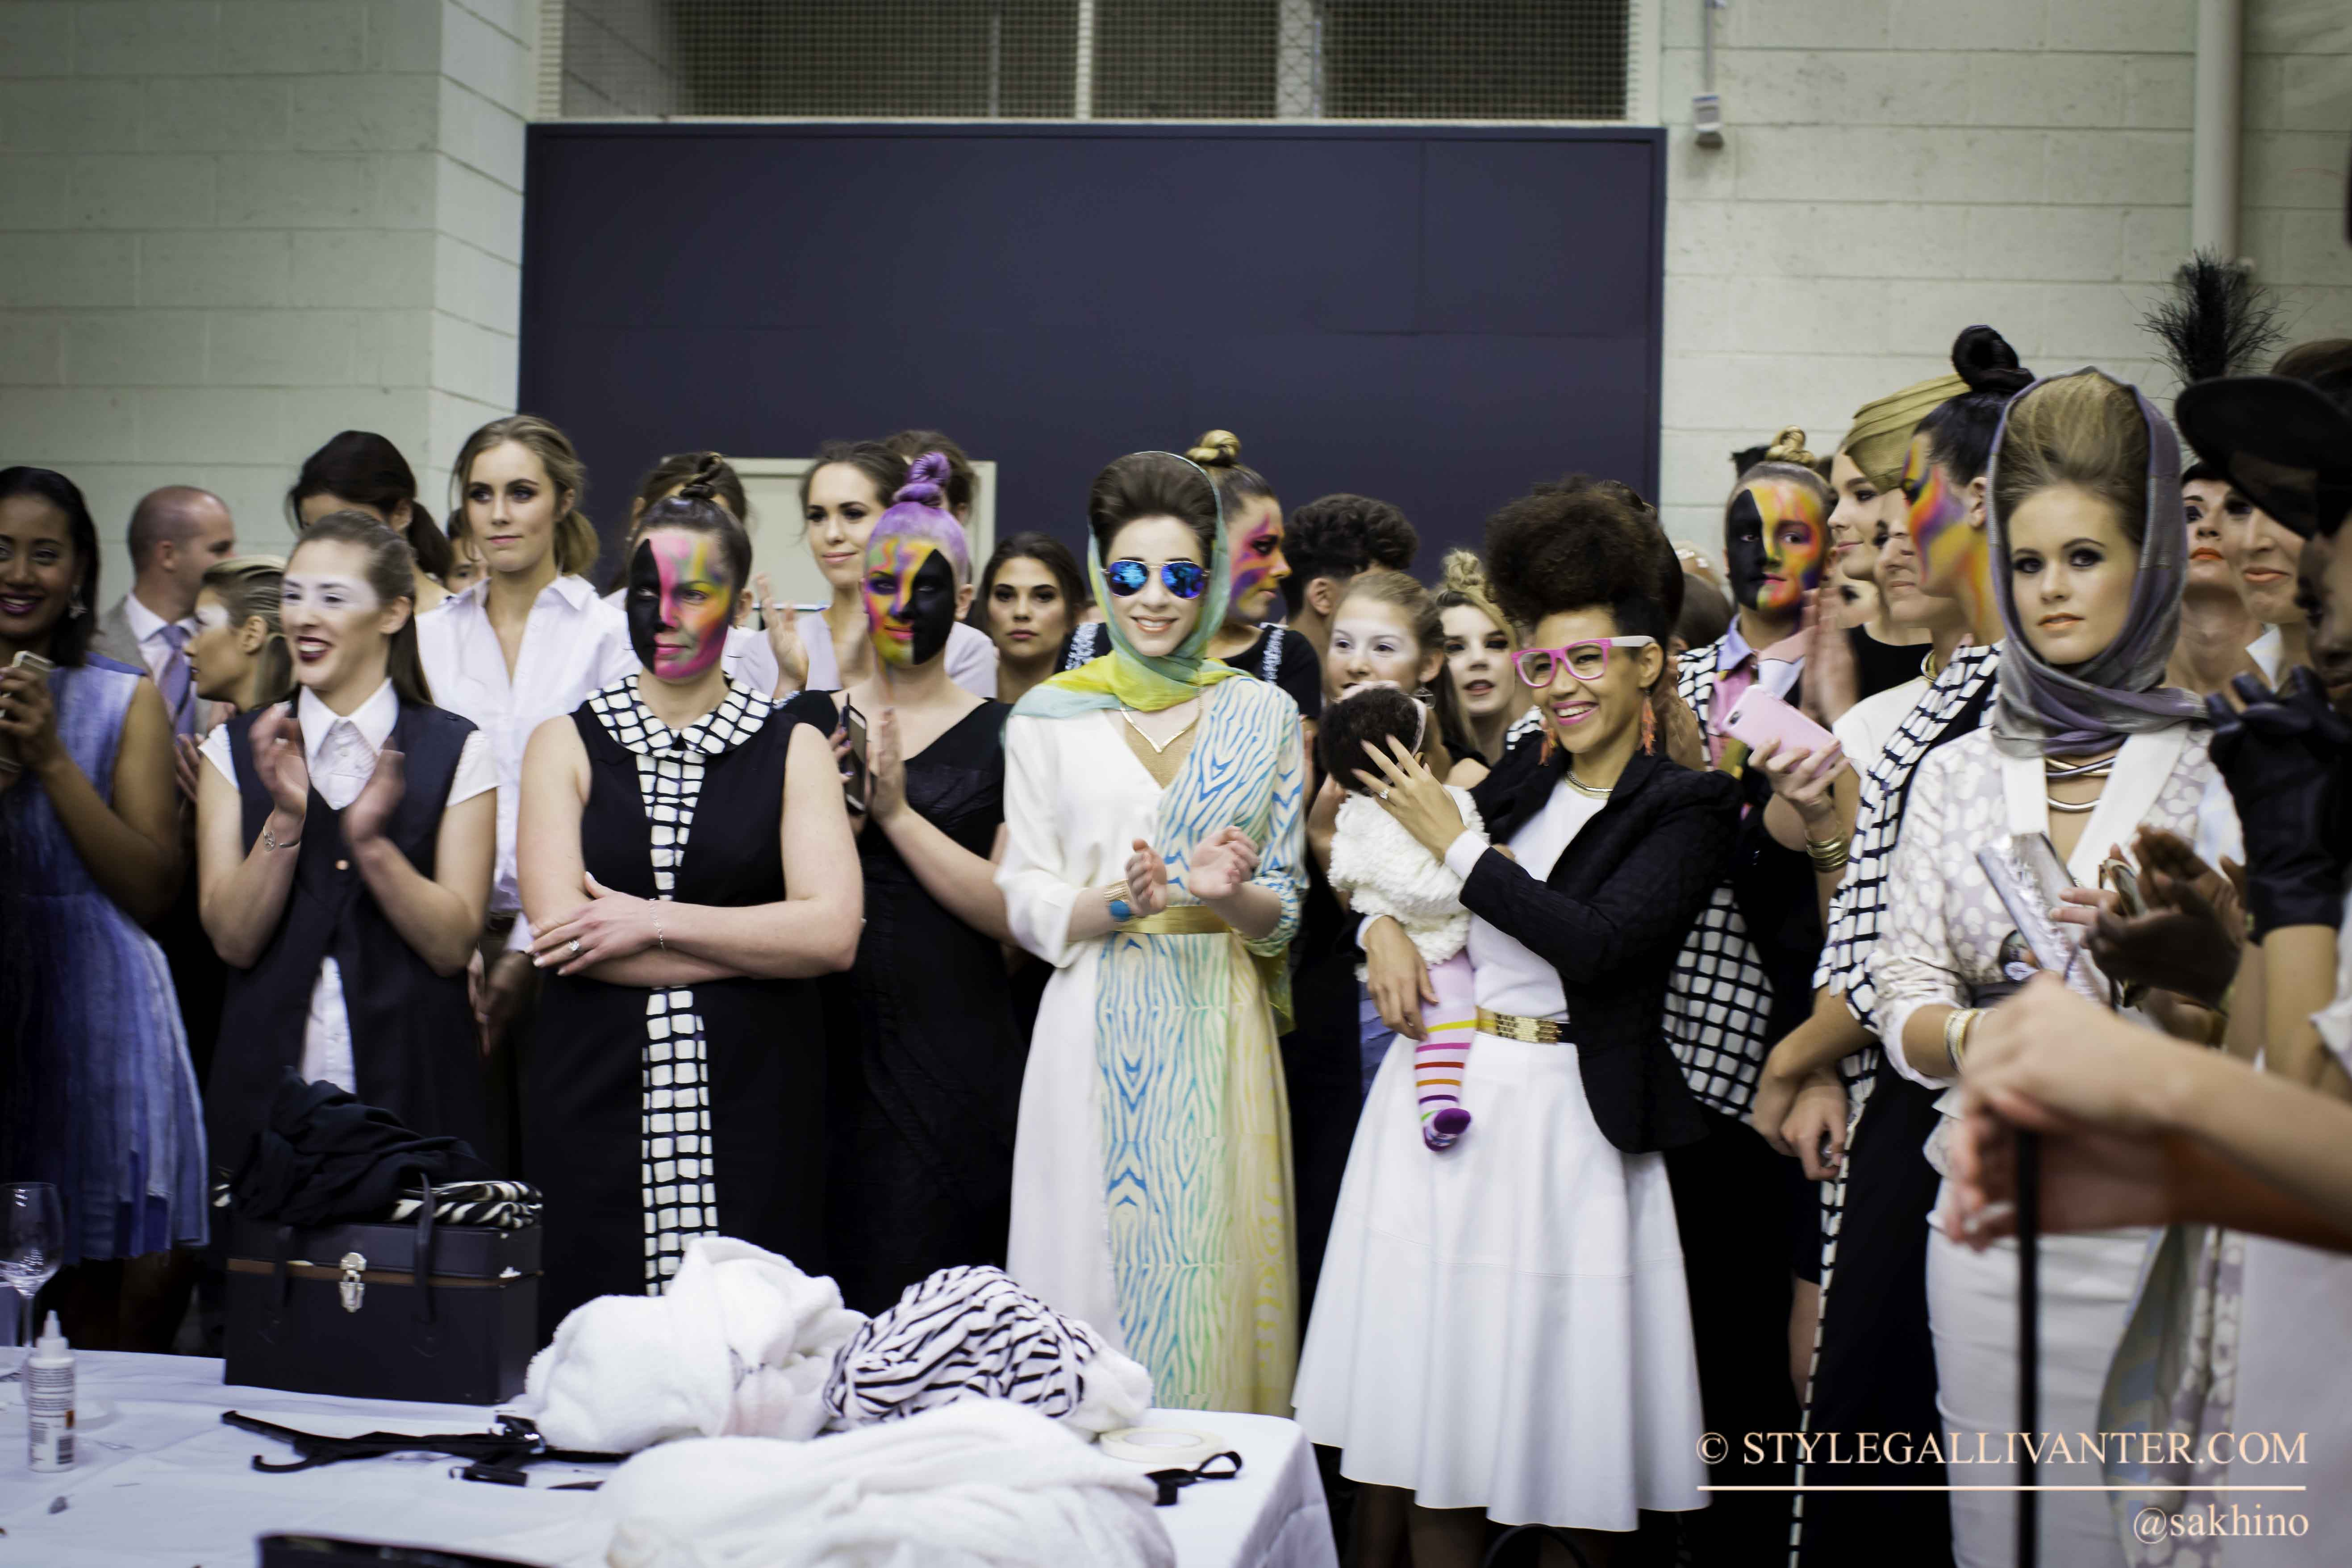 stylegallivanter.com-copyright-2015_not-to-be-used-without-permission_PHOTOGRAPHY-CREDIT-ANDREW-KIBUKA_fashfest-2015-audi_fashfest-2015-backstage-3